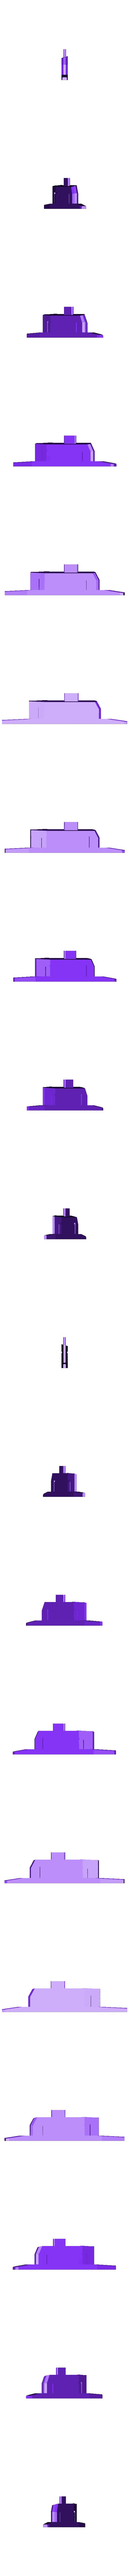 24- PYLON 3.stl Download STL file DOUGLAS F4D SKYRAY  • 3D printer object, 3DprintedArmy